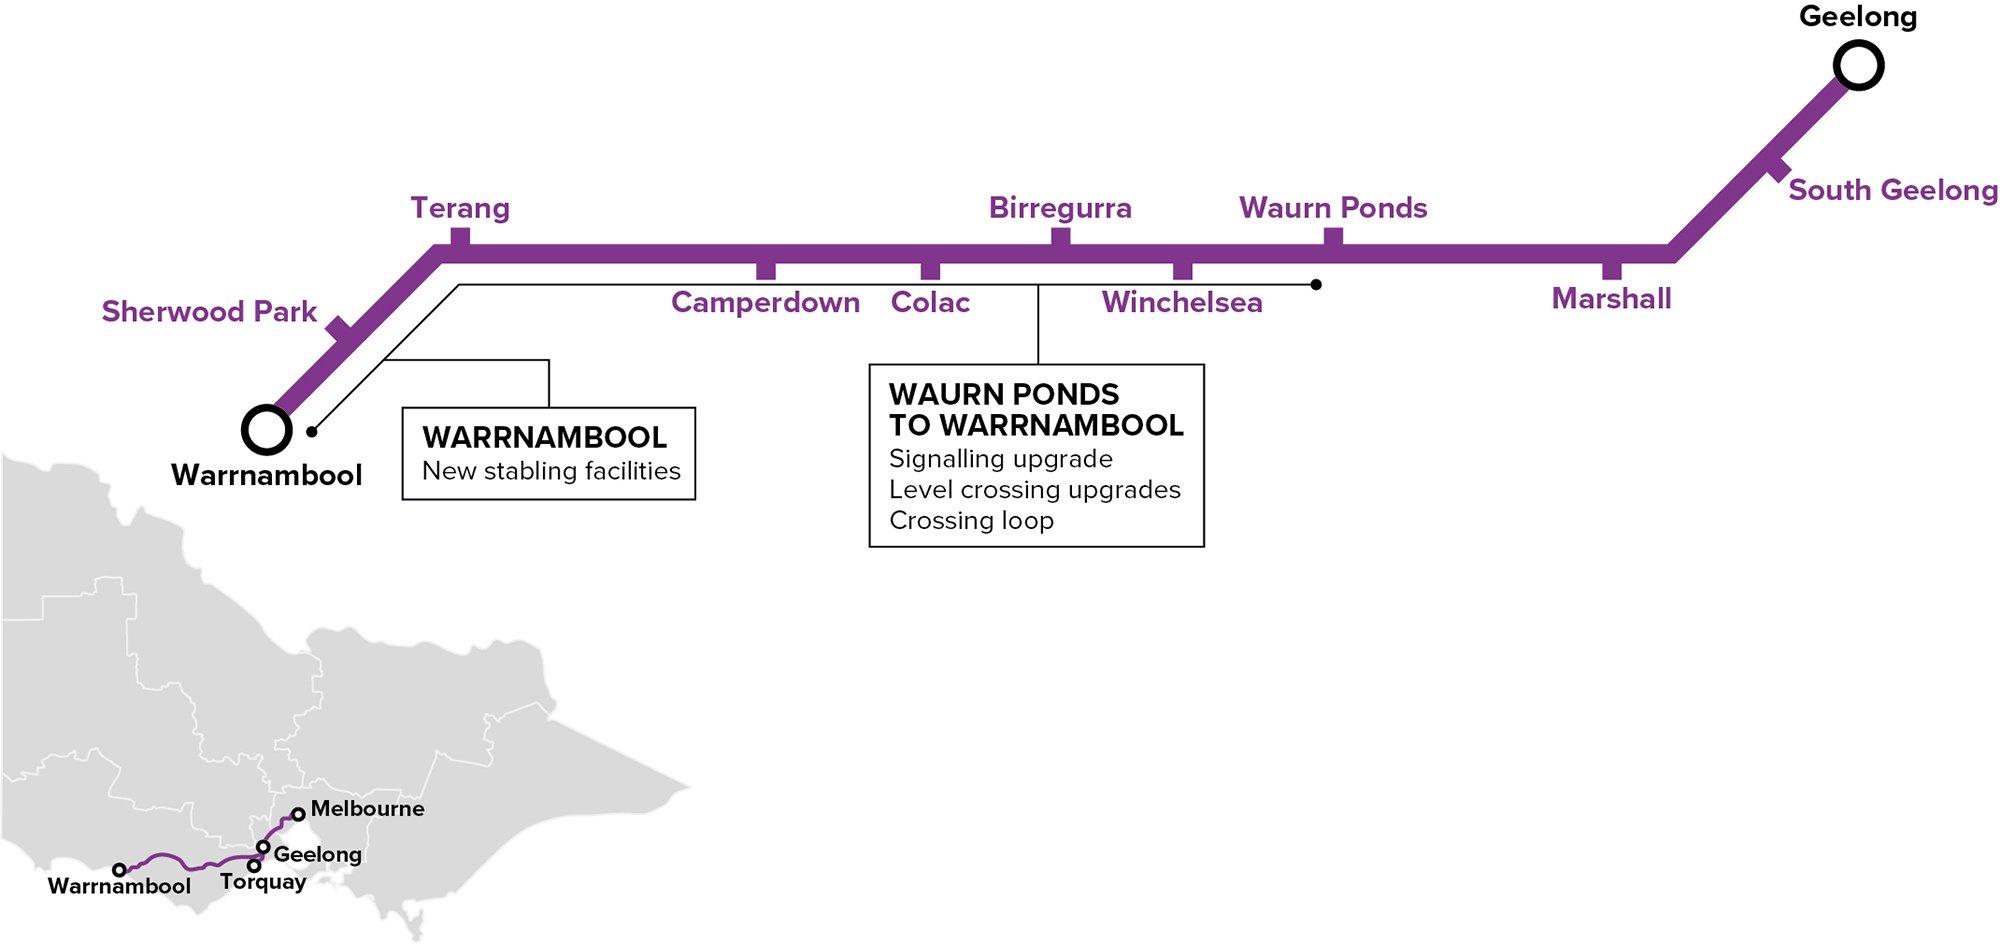 RRR-Warrnambool-Line-Map-Works-A4-Factsheet-v3-1